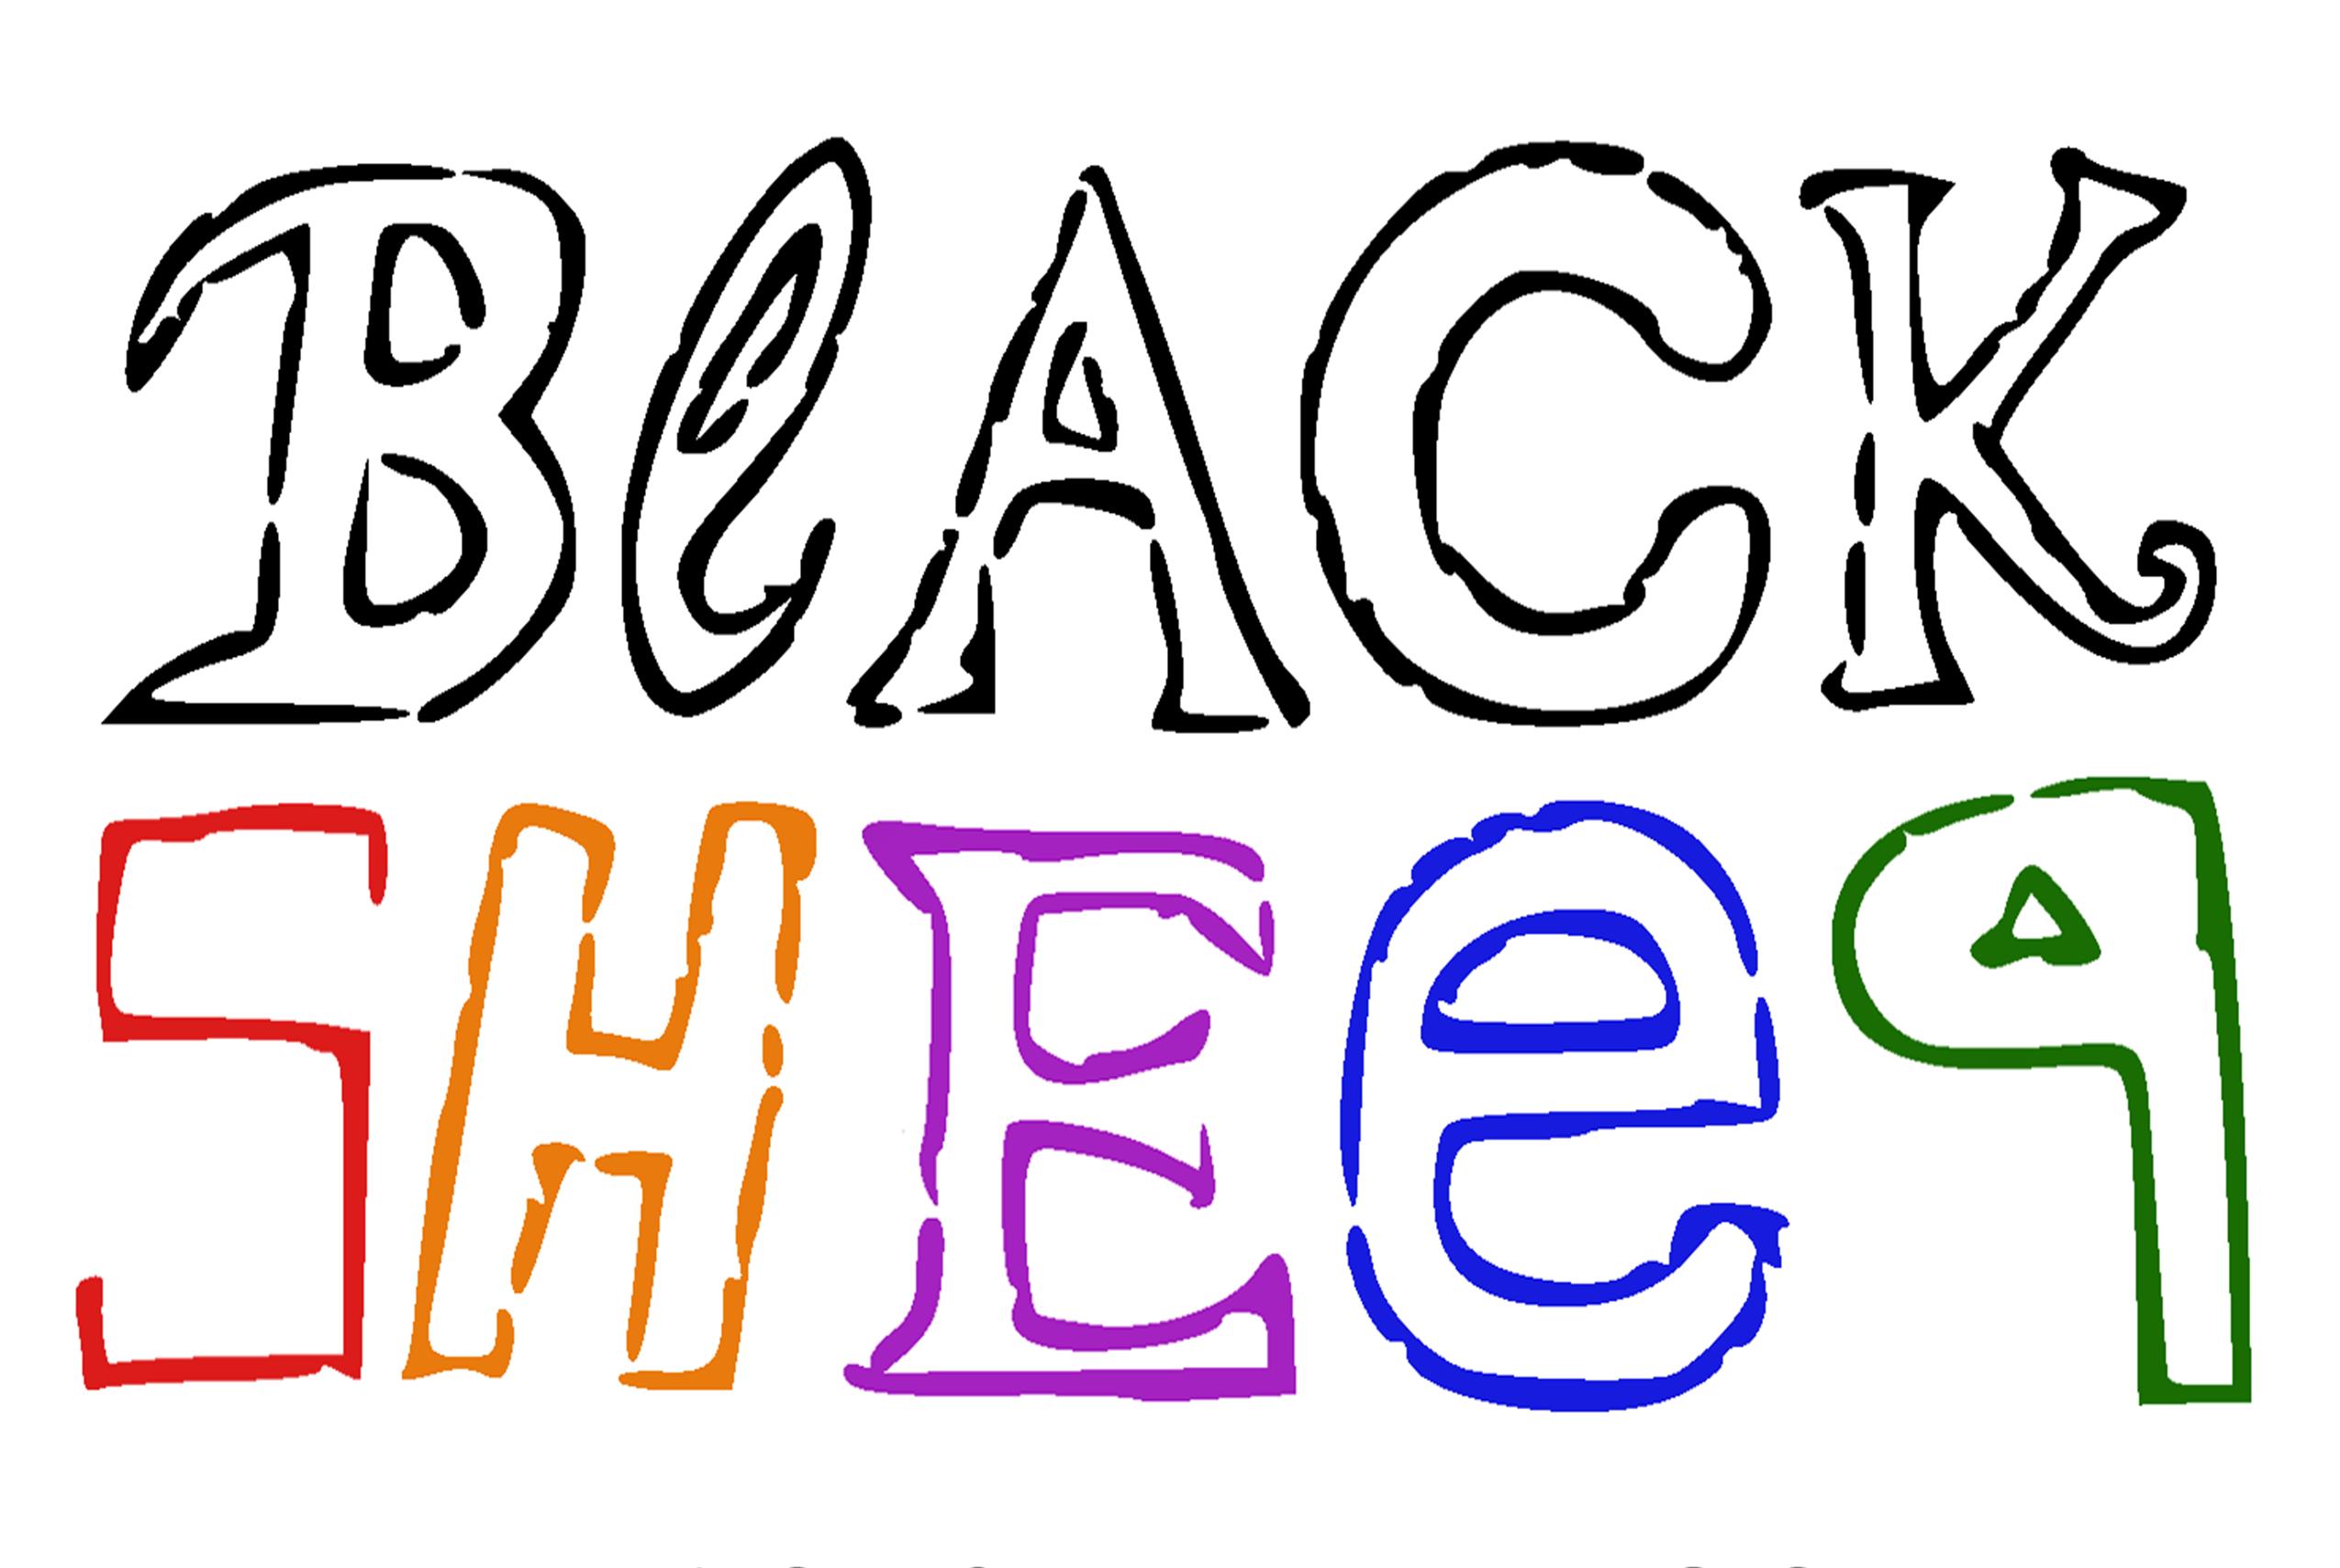 BlackSheep.blog